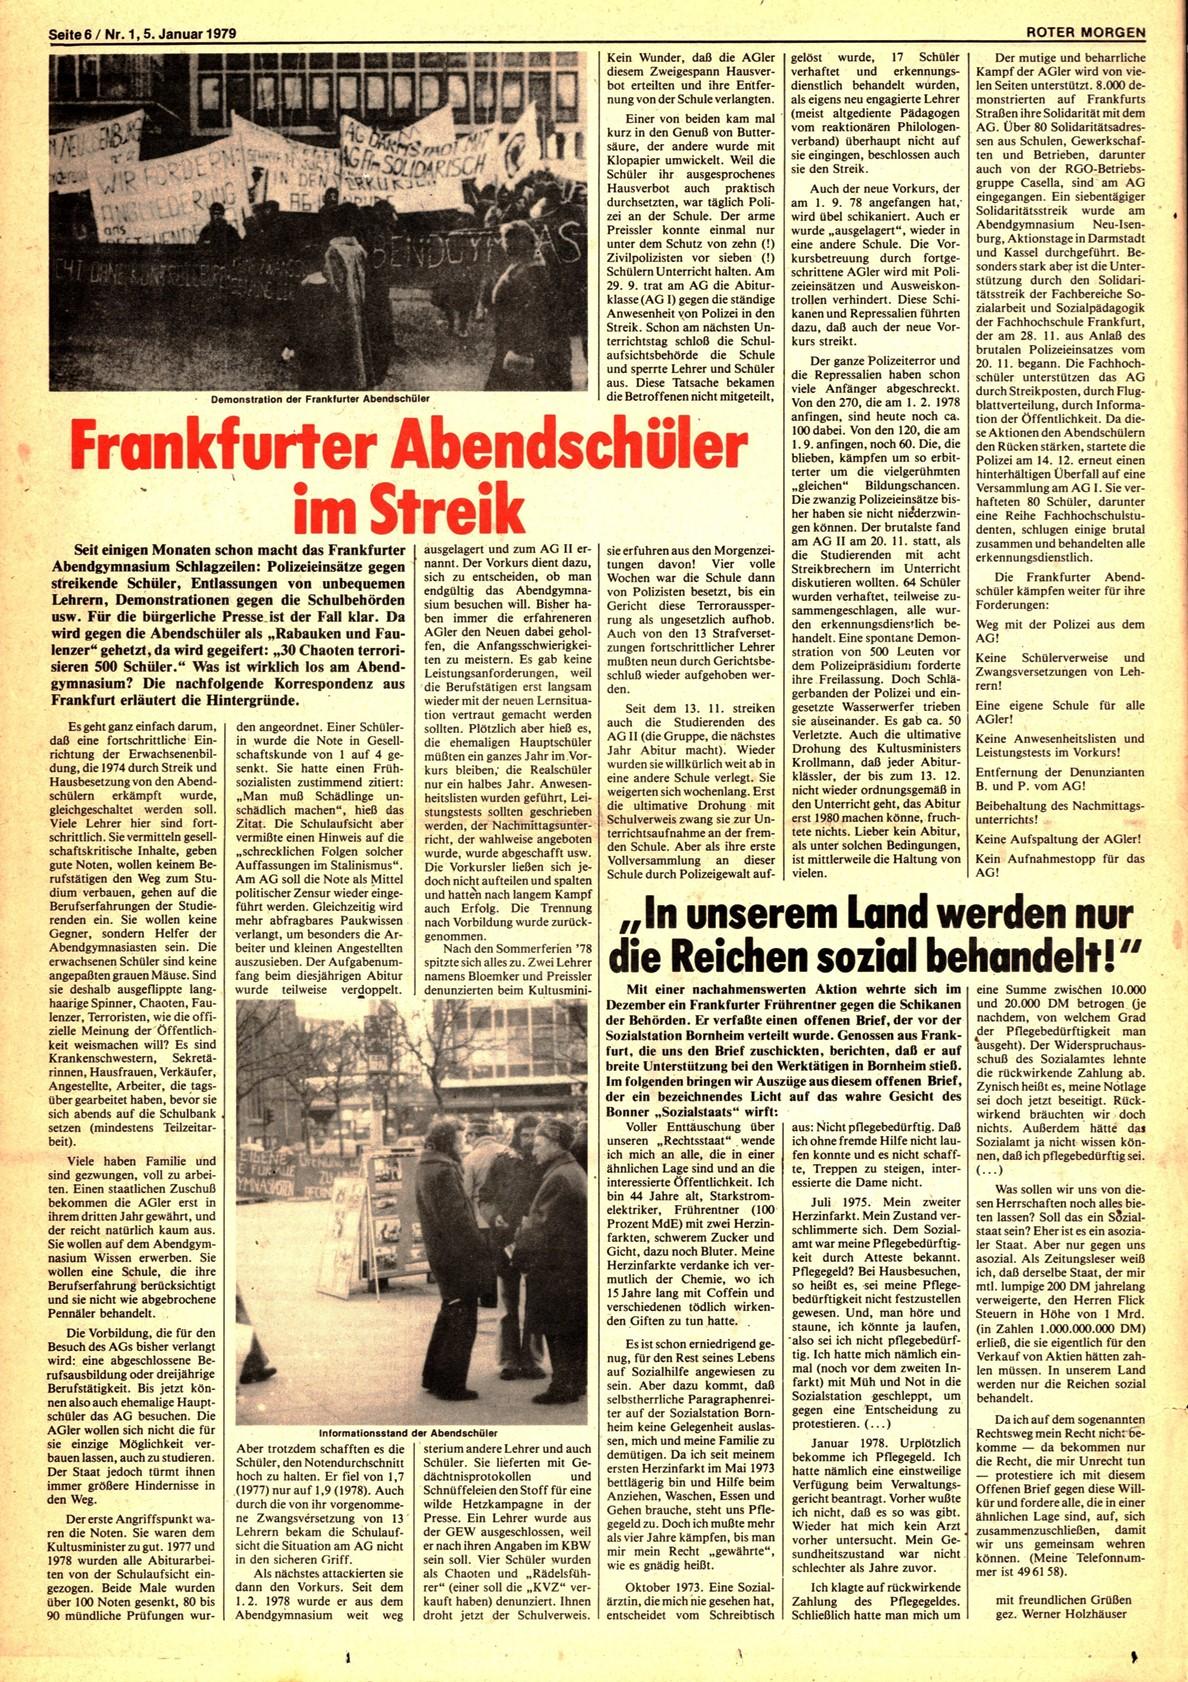 Roter Morgen, 13. Jg., 5. Januar 1979, Nr. 1, Seite 6